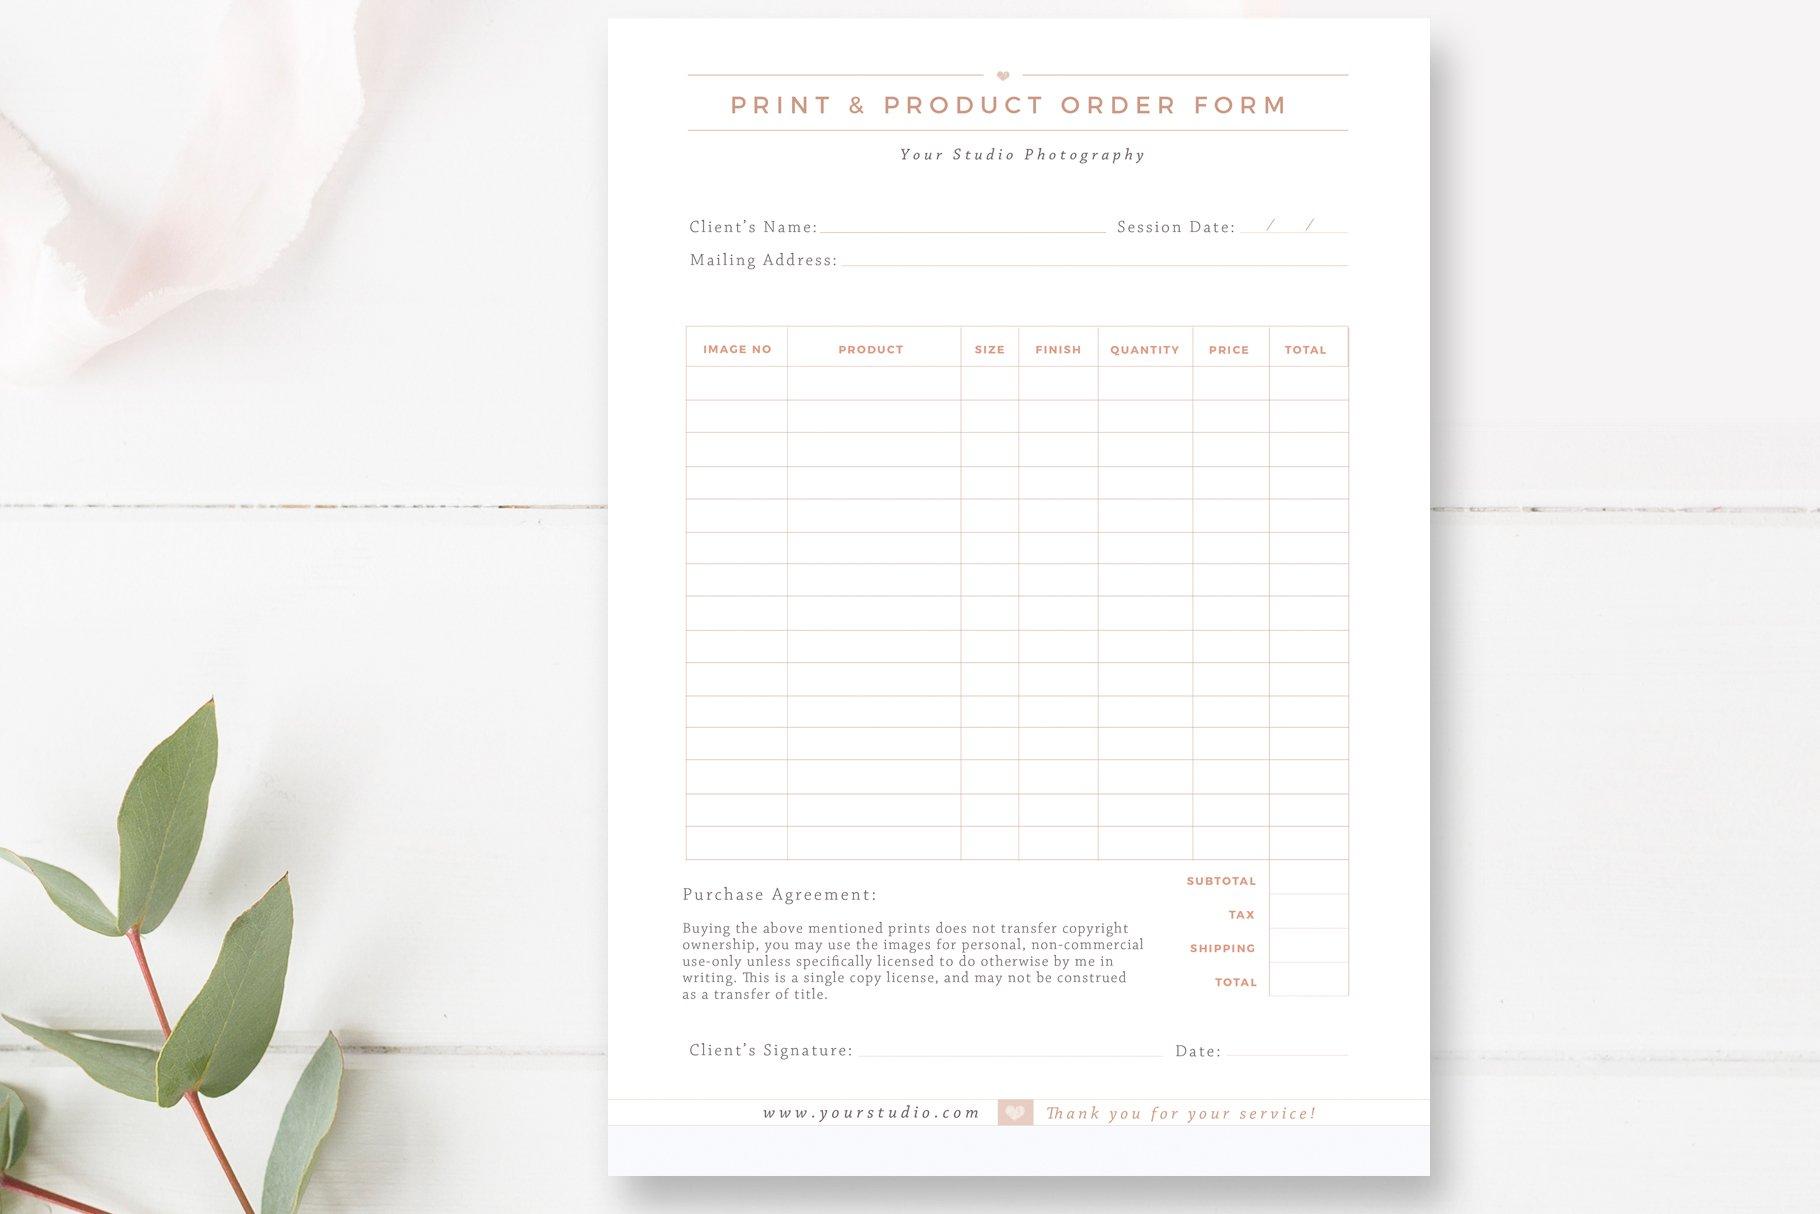 Print Product Order Form Creative Photoshop Templates Creative Market